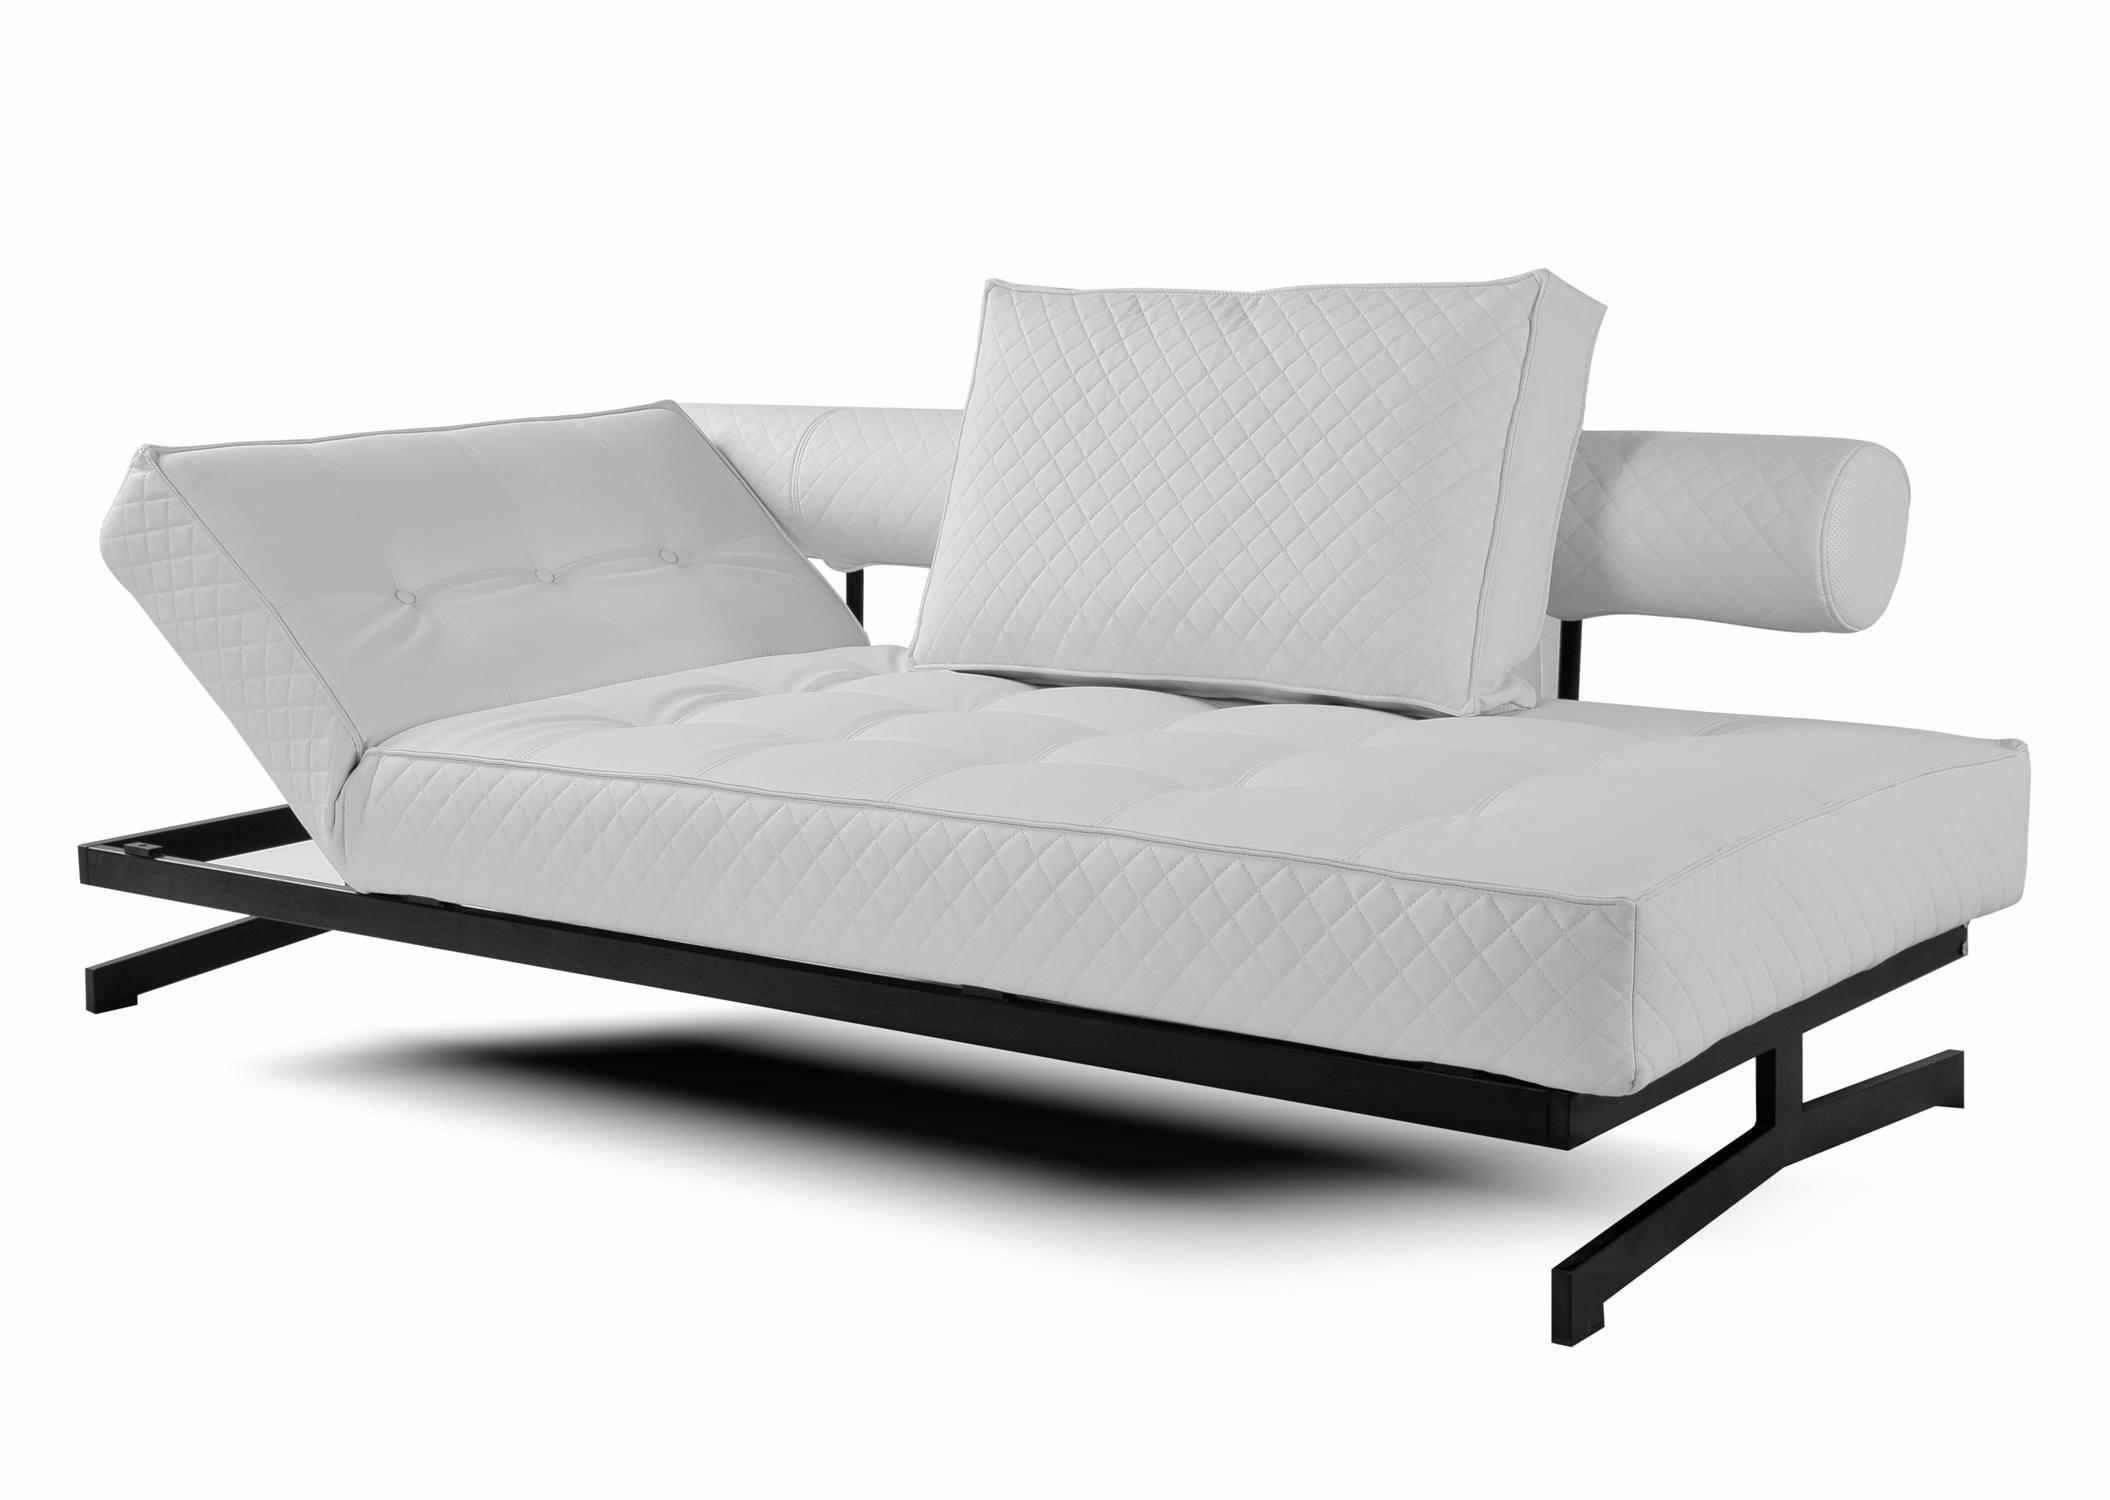 Sofa Lounger | Sofa inside Euro Sofa Beds (Image 12 of 15)